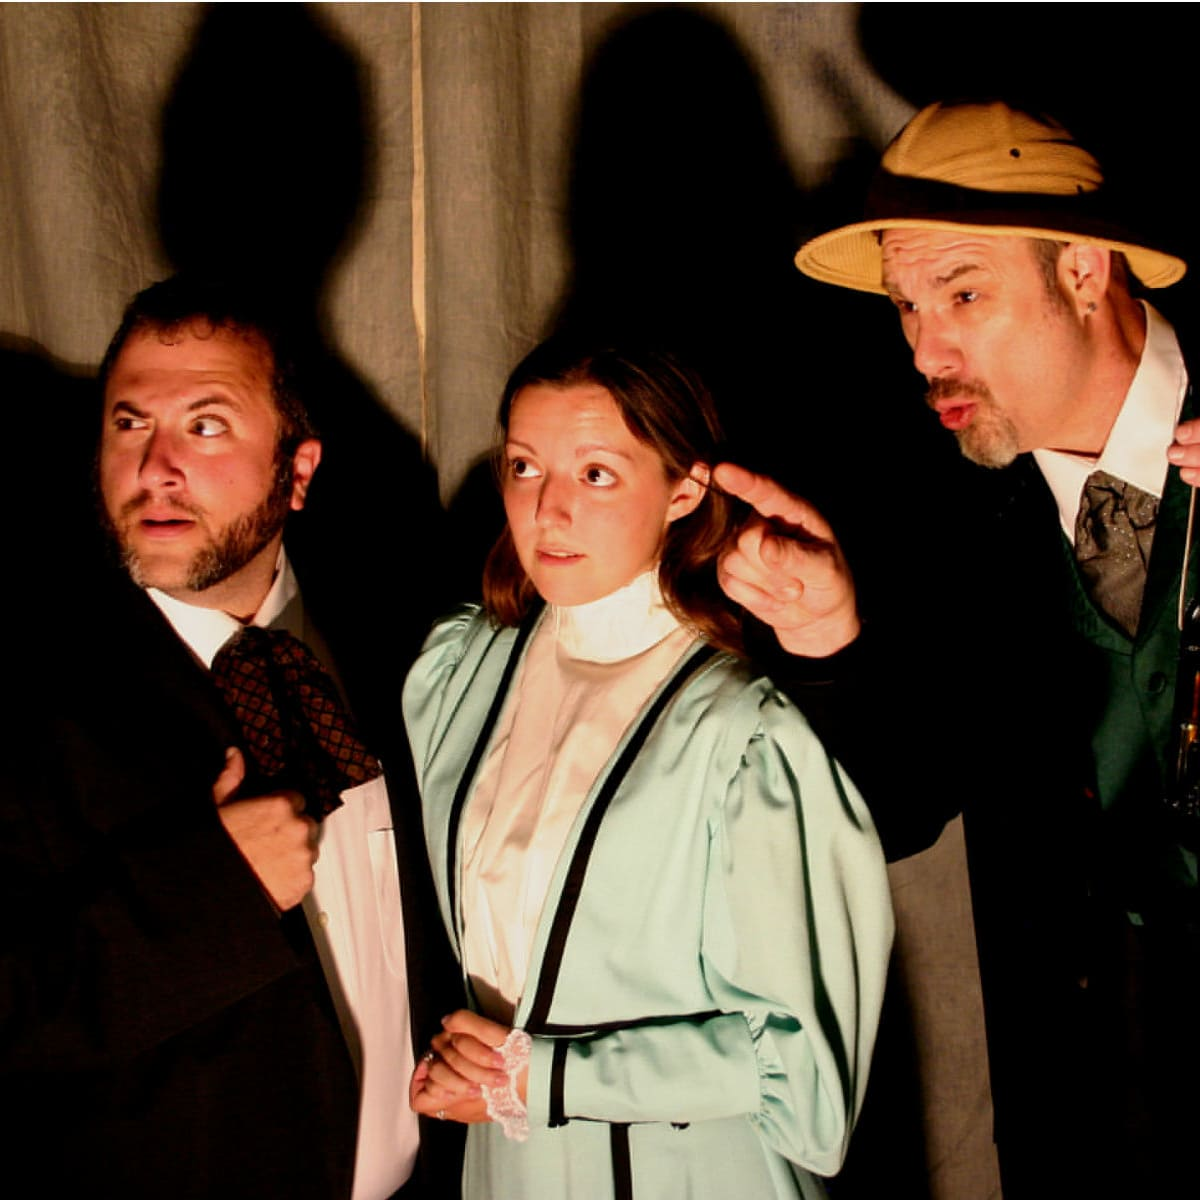 Pocket Sandwich Theatre presents The Werewolf of London